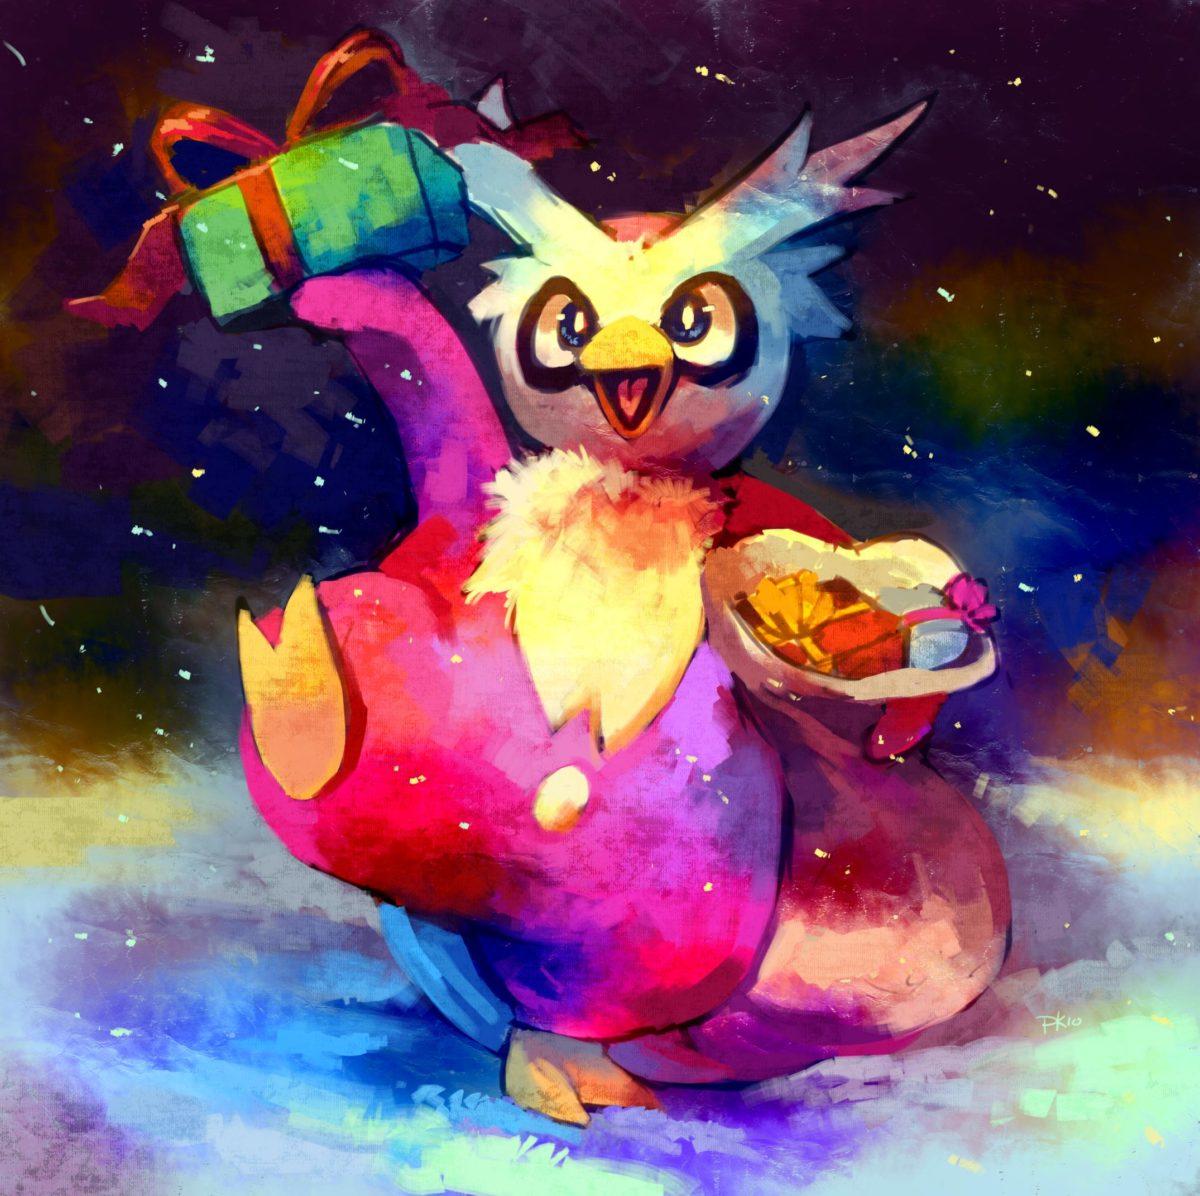 Delibird | Type glace | Pinterest | Pokémon, Pokemon stuff and Nintendo